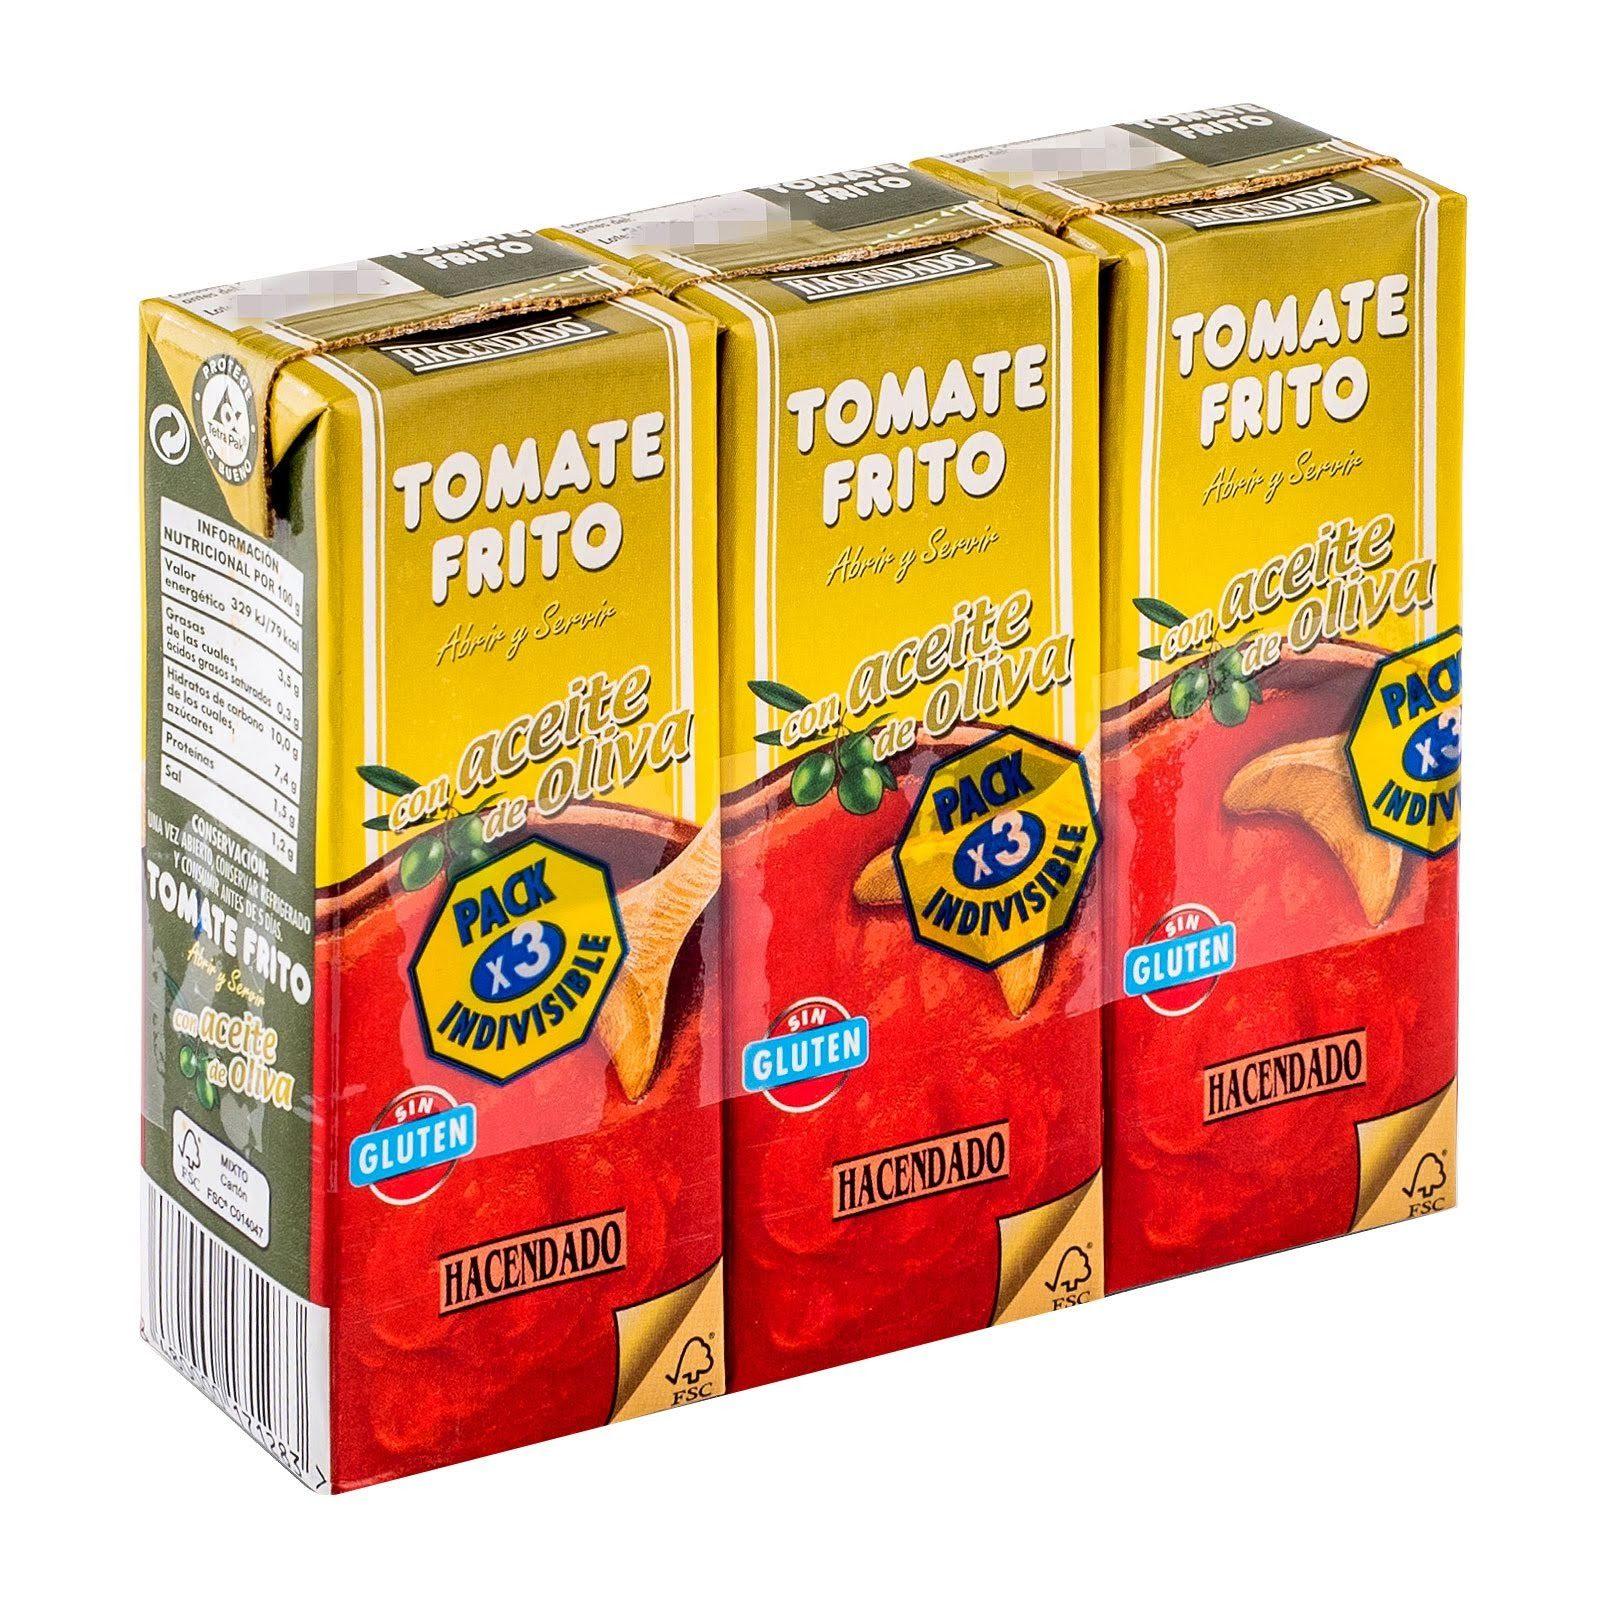 tomate-frito-con-aceite-de-oliva-hacendado-mercadona-1-4513089